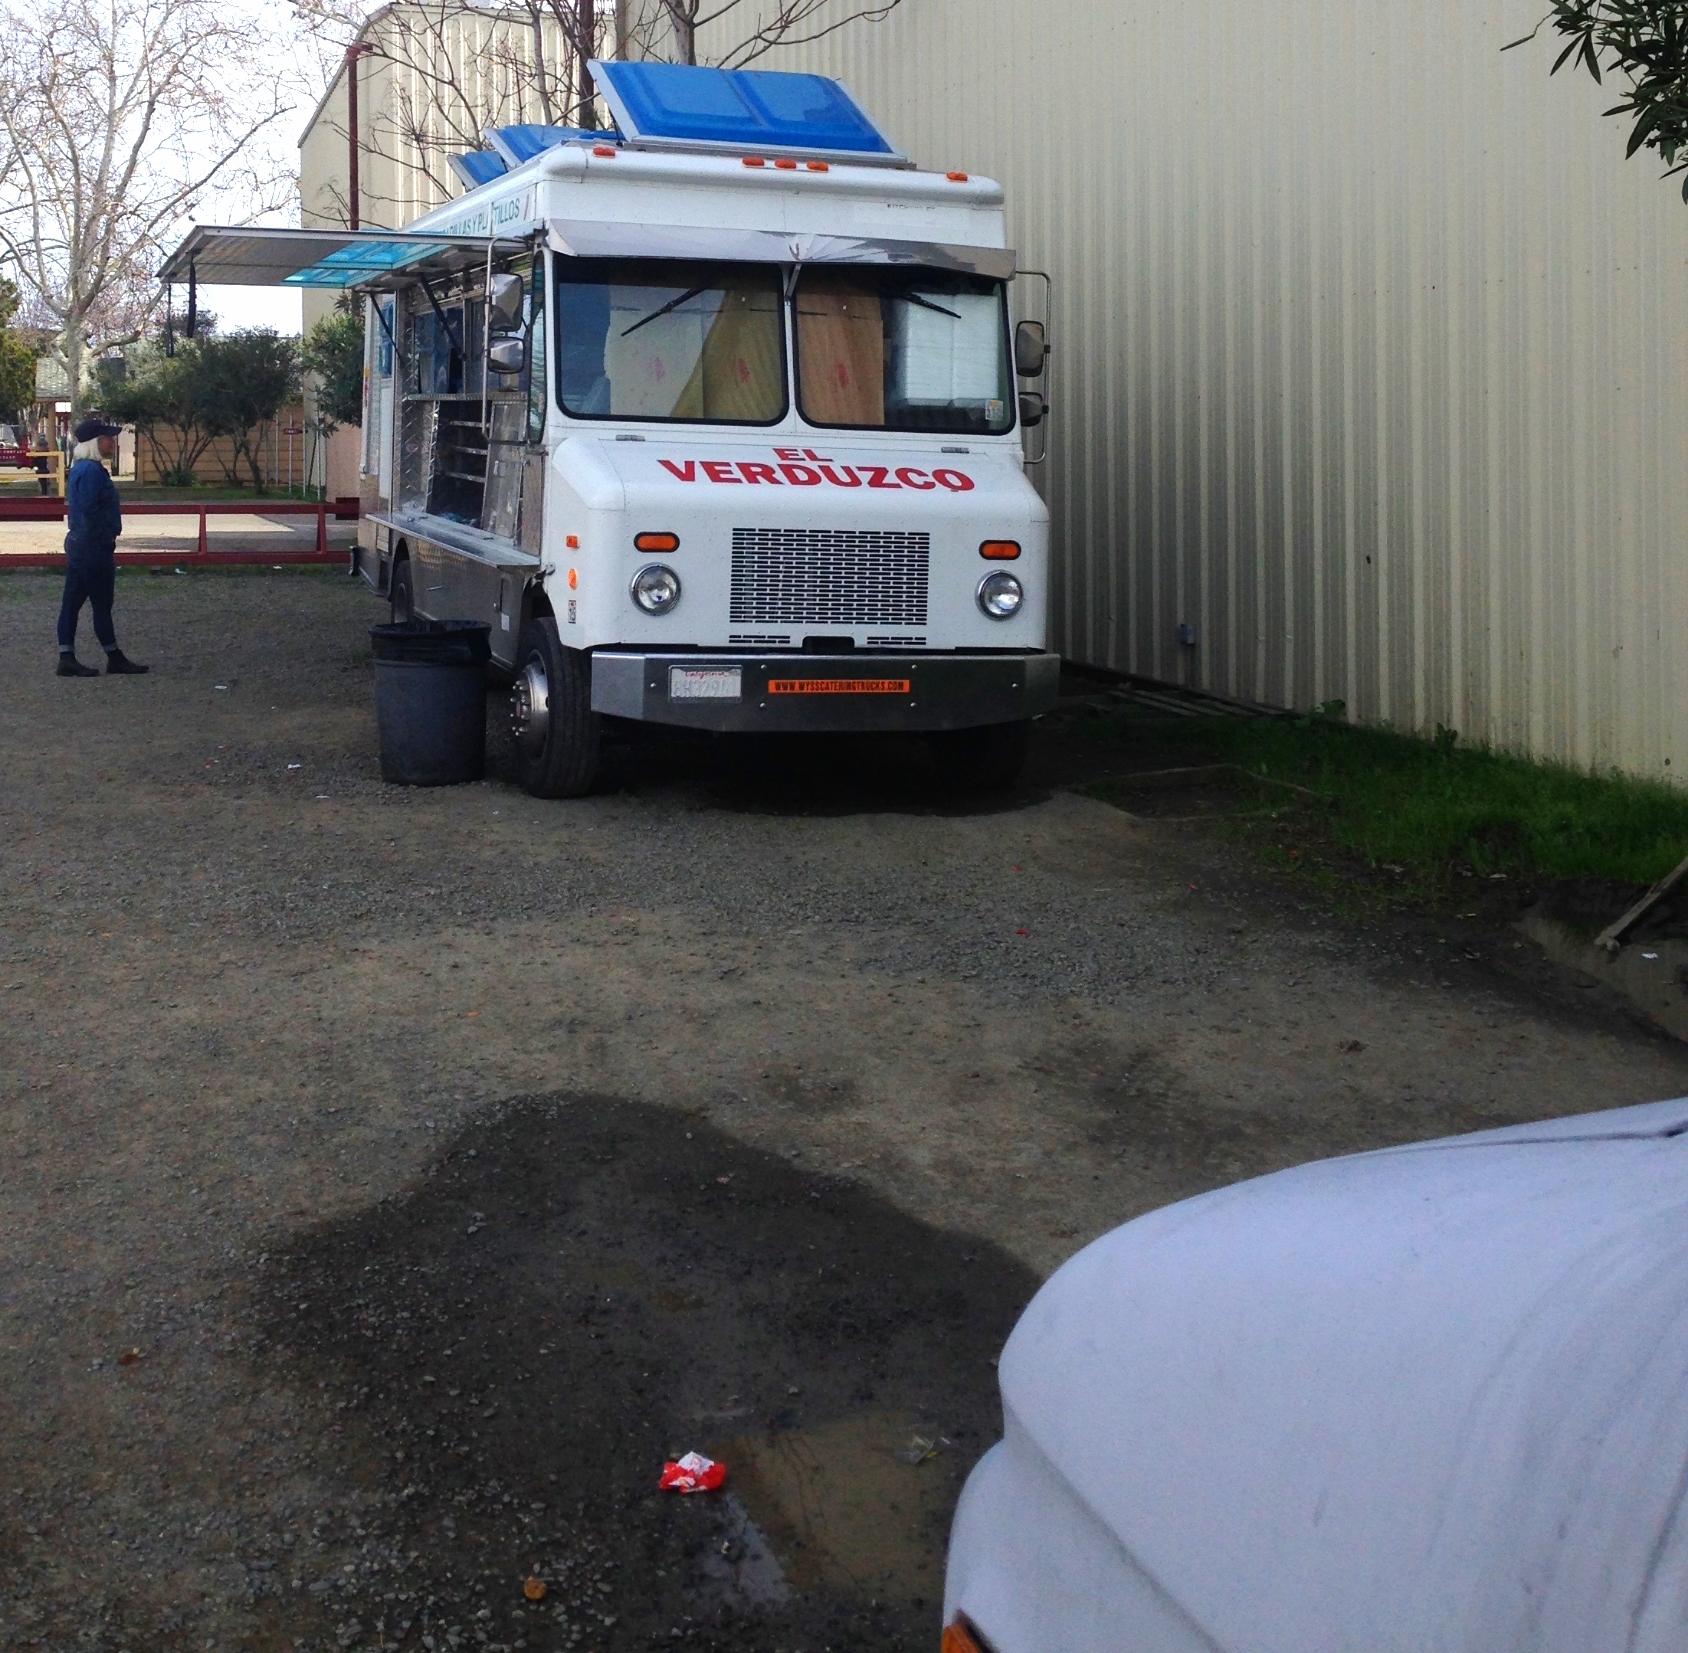 Taco truck in Winters, CA